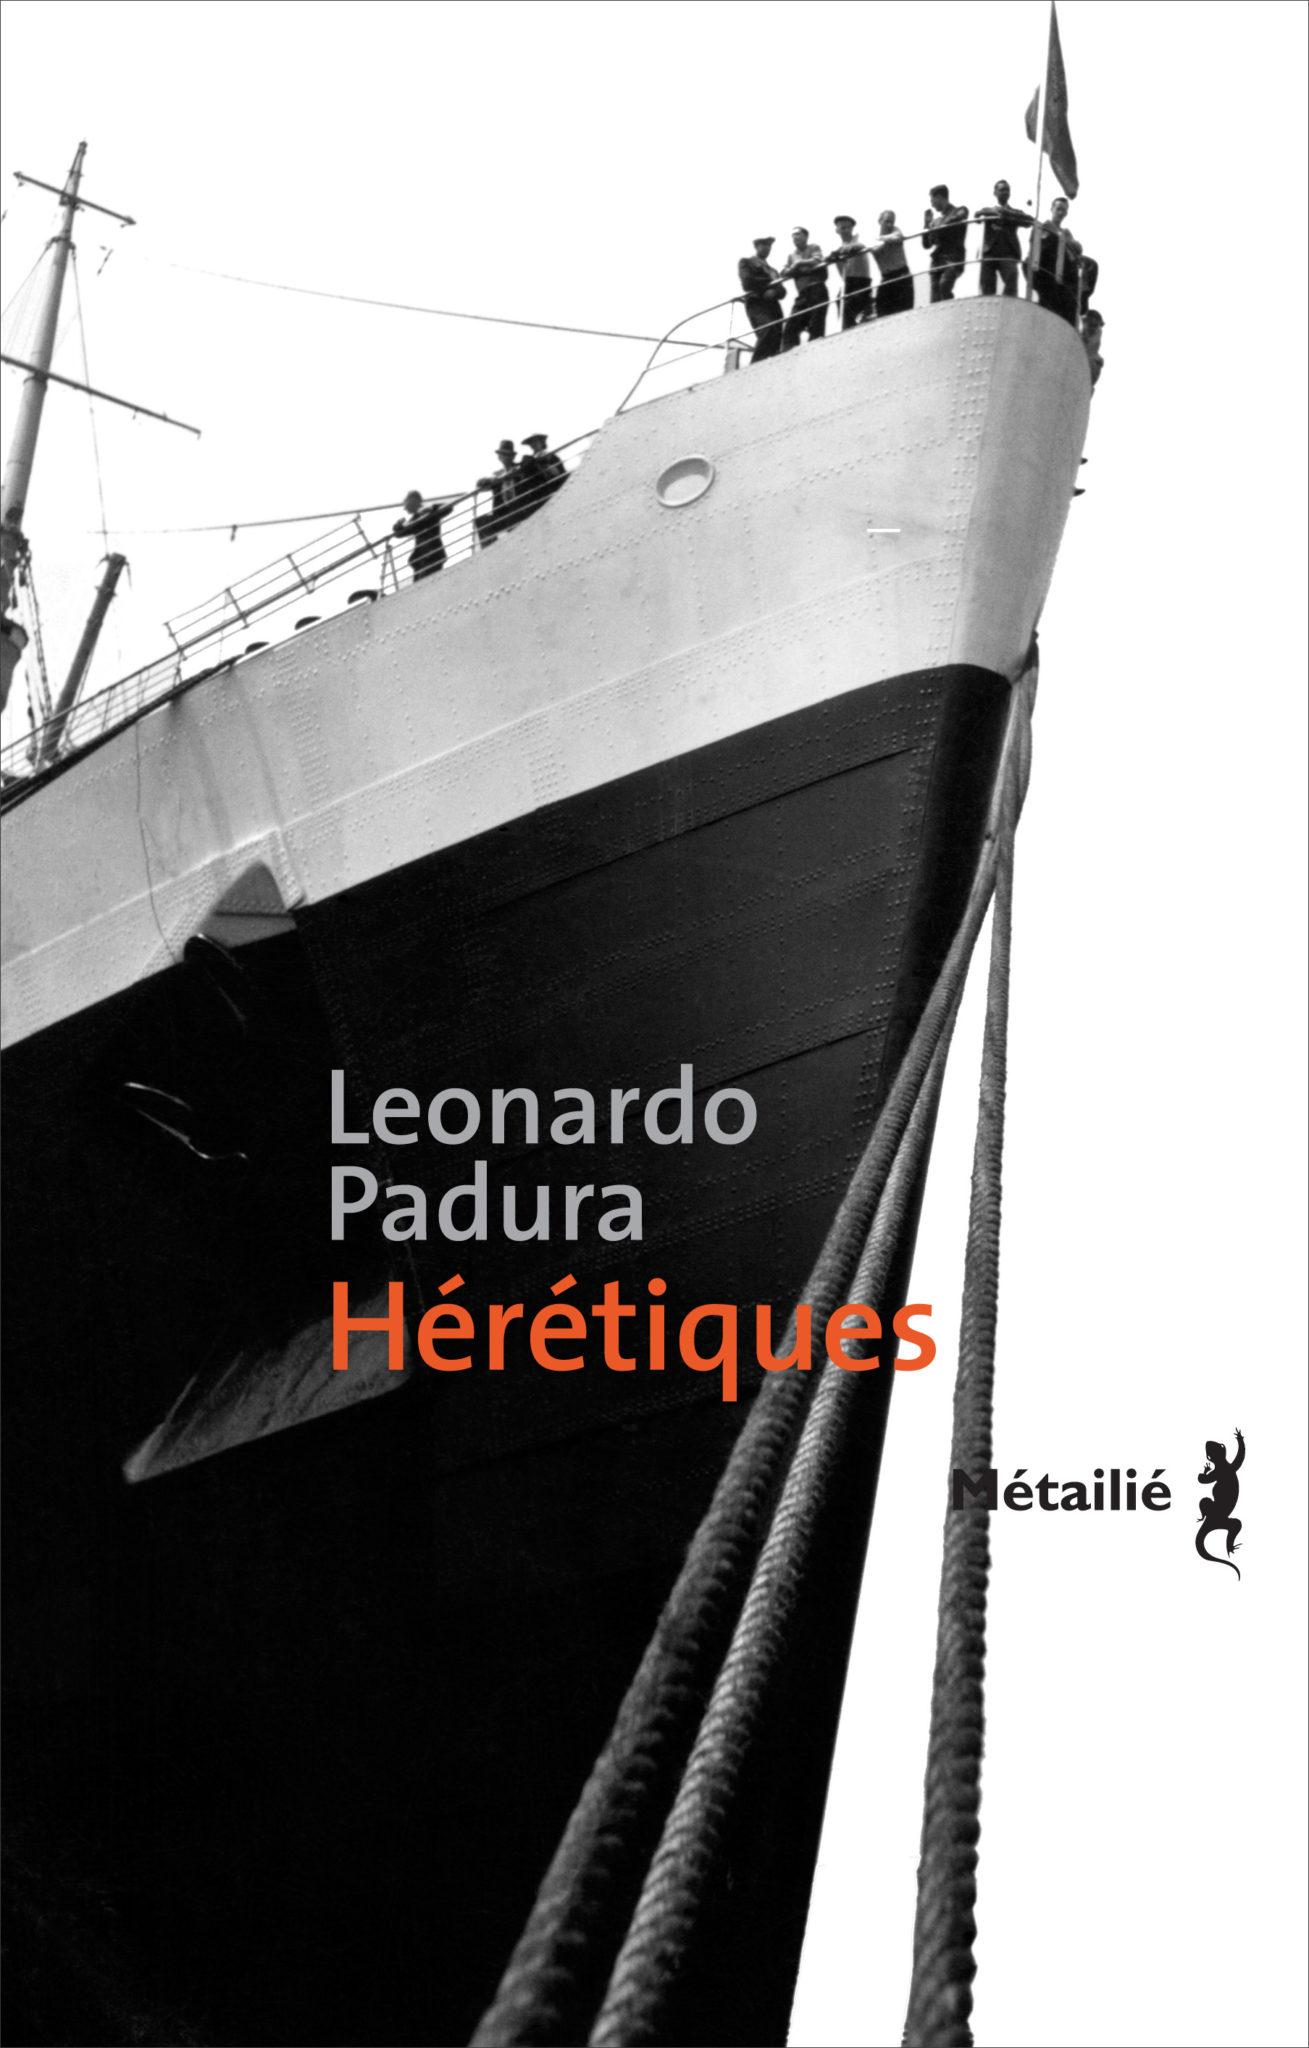 « Hérétiques » de Leonardo Padura, Métaillé